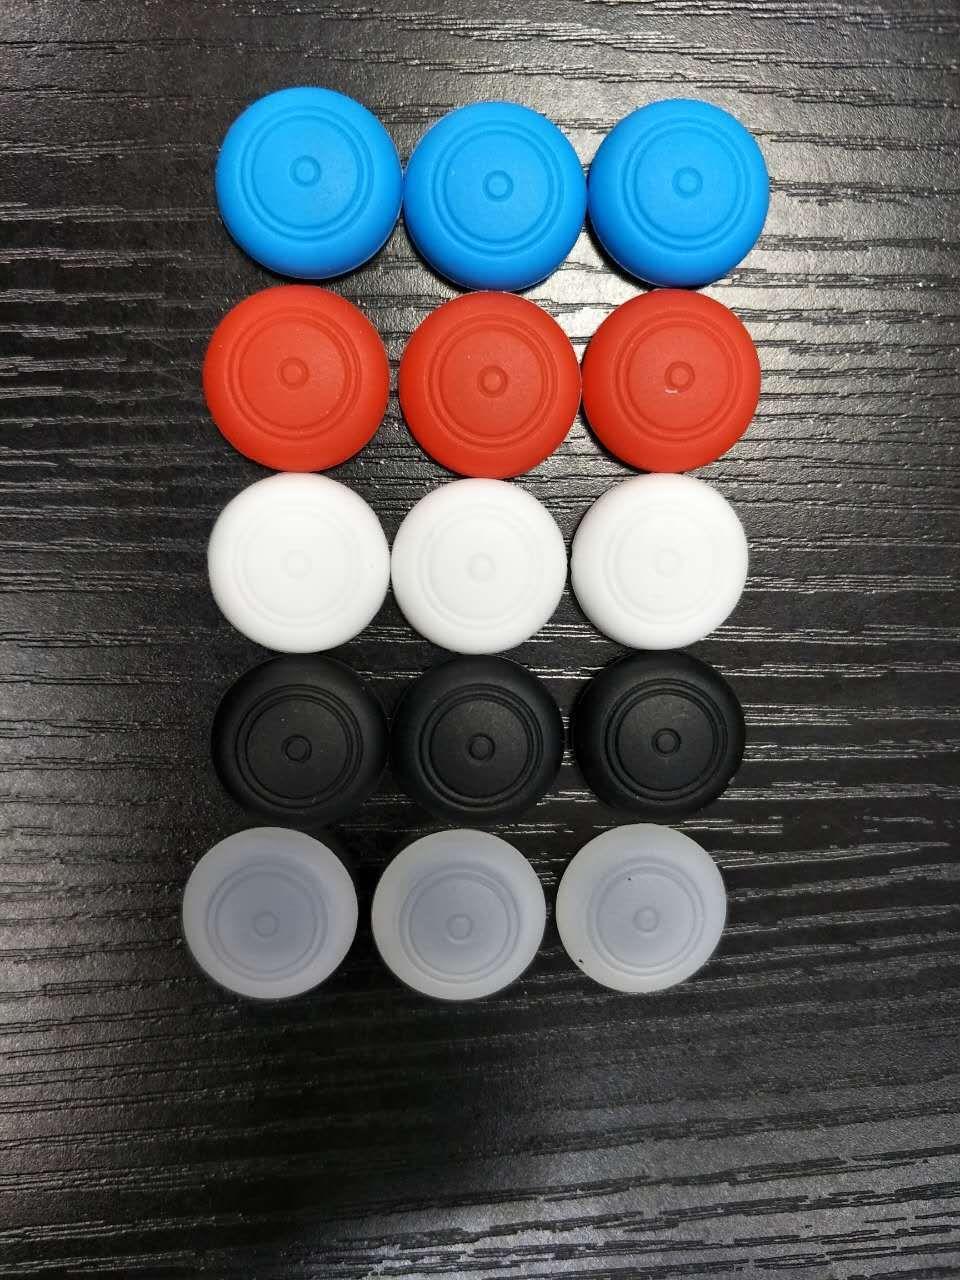 Rubber Silicone Joystick Cap Thumb Stick Joystick Grip Grips Caps For Nintendo switch NS NX Controller